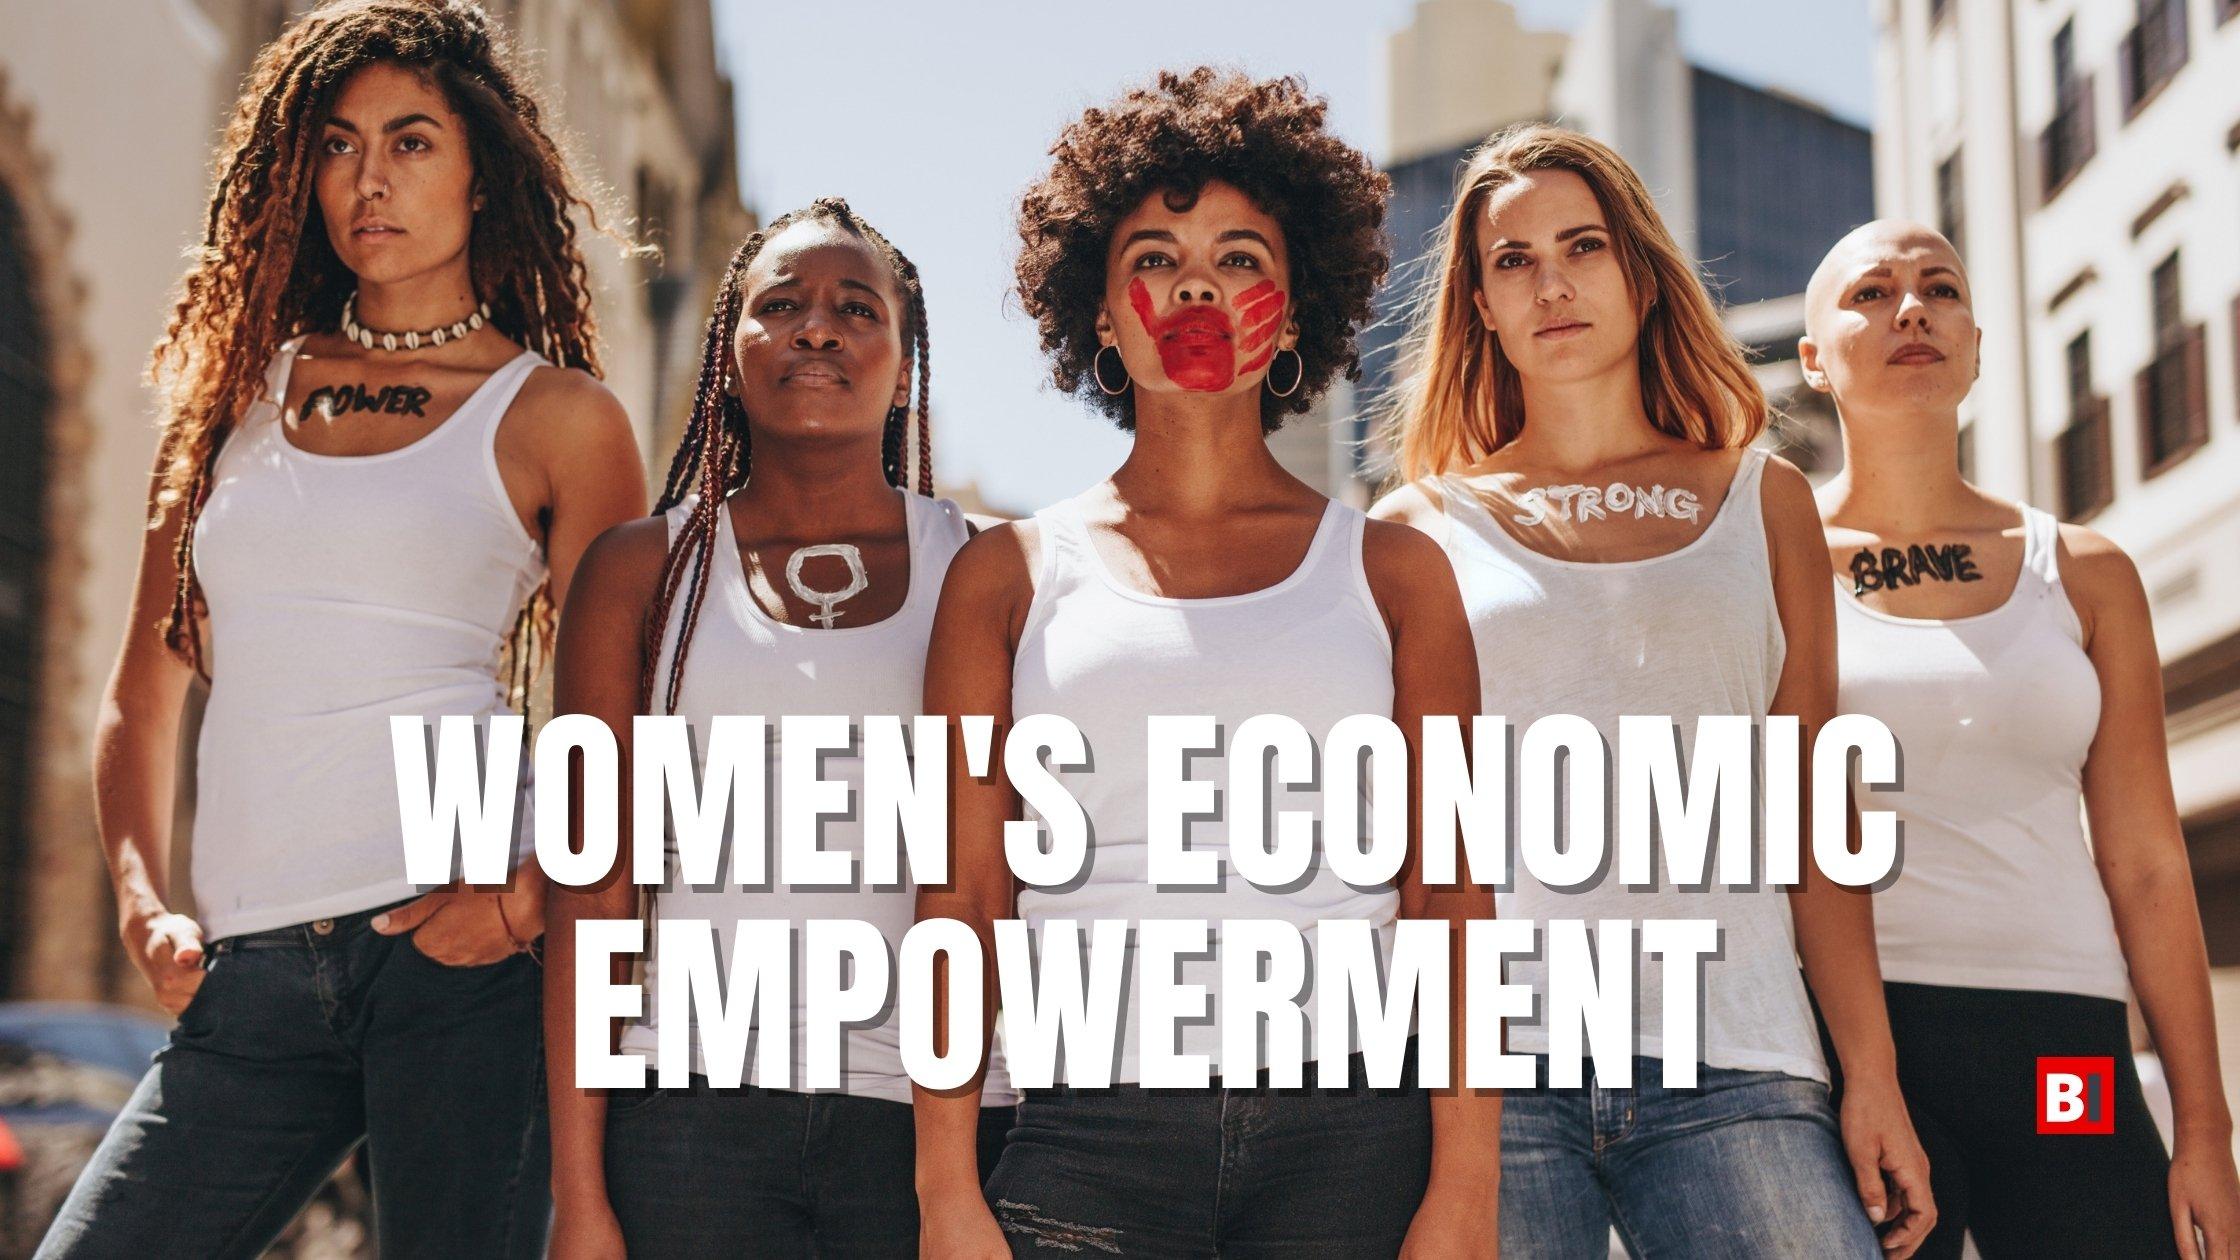 Best Books on Women's Economic Empowerment